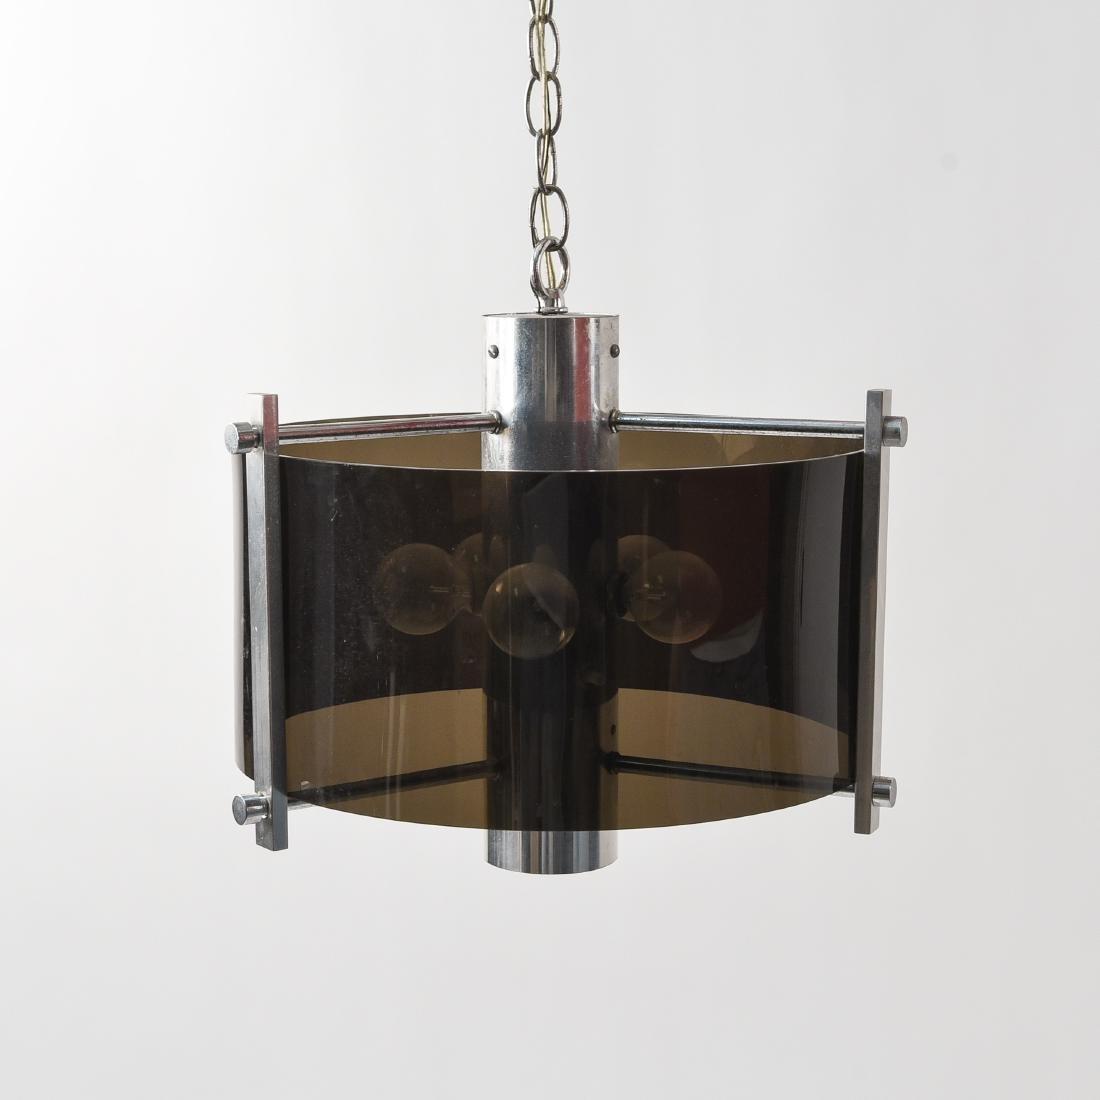 MID-CENTURY CHROME & LUCITE HANGING LIGHT FIXTURE